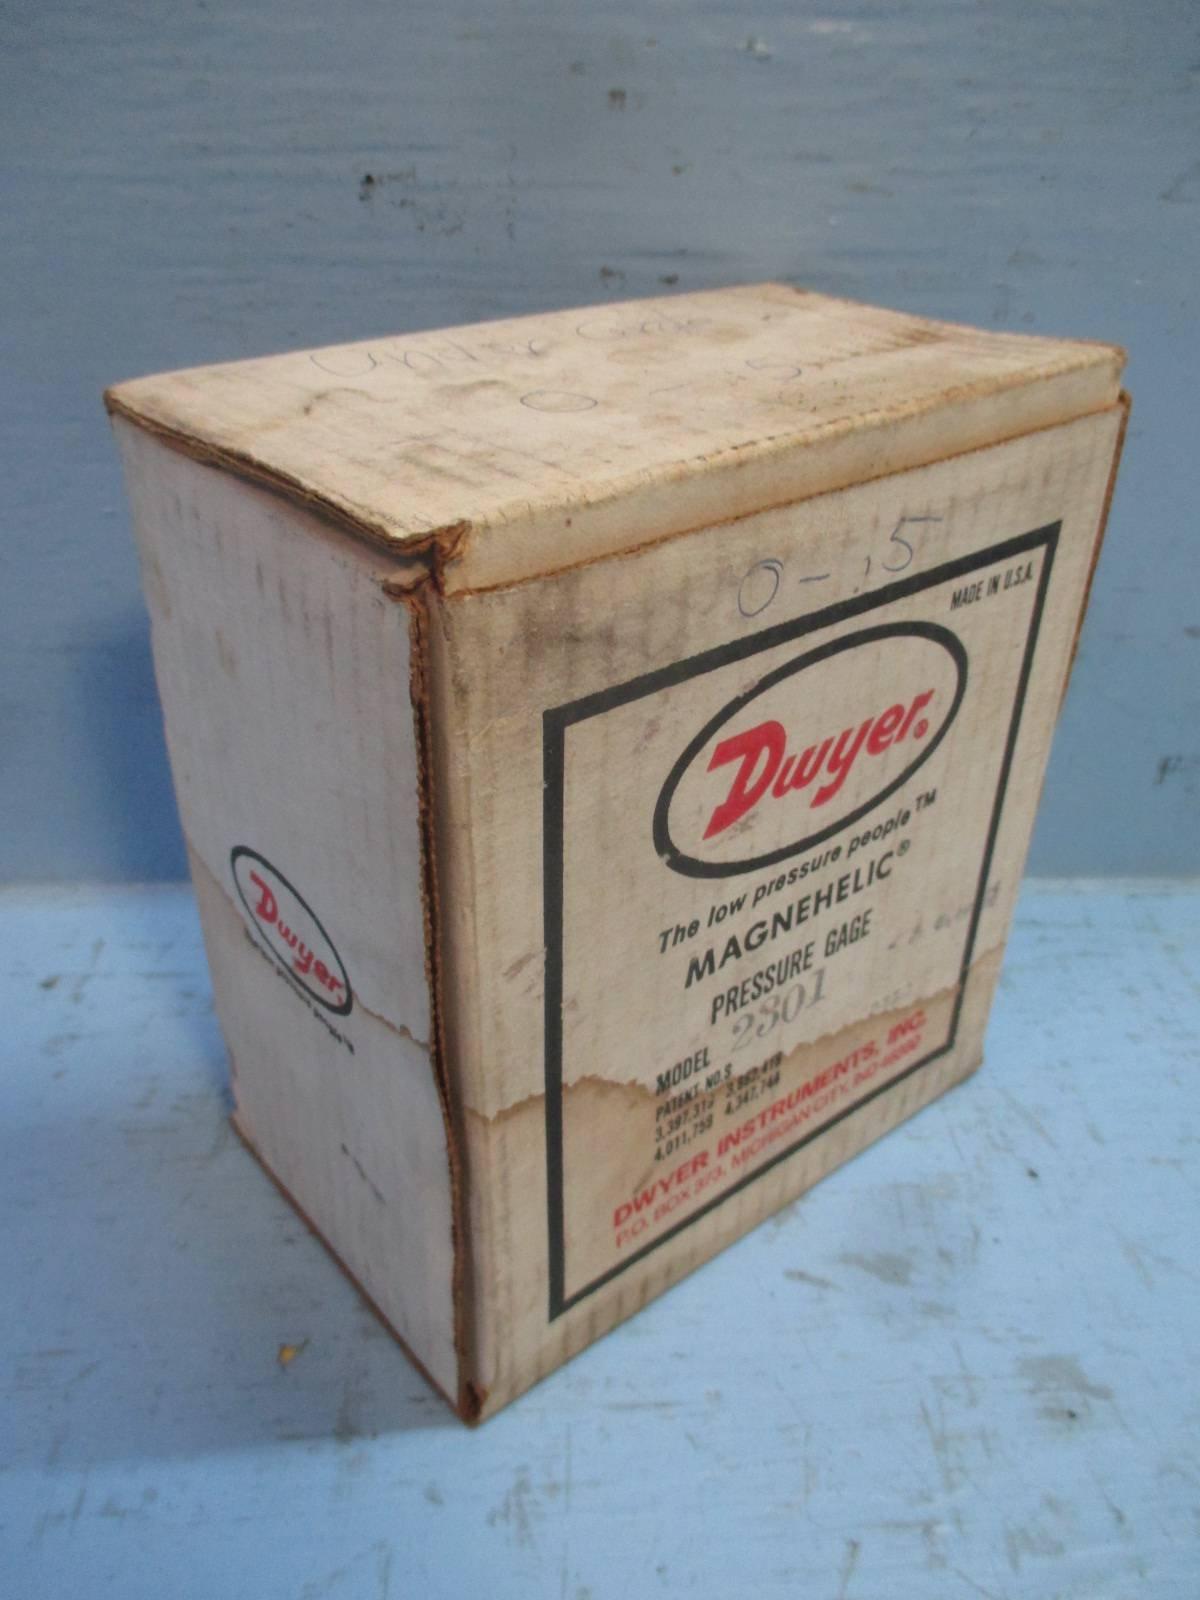 Dwyer® Magnehelic® Differential Pressure Gage, 2301, Zero Center Range: .50-0-.50'' w.c. by Dwyer